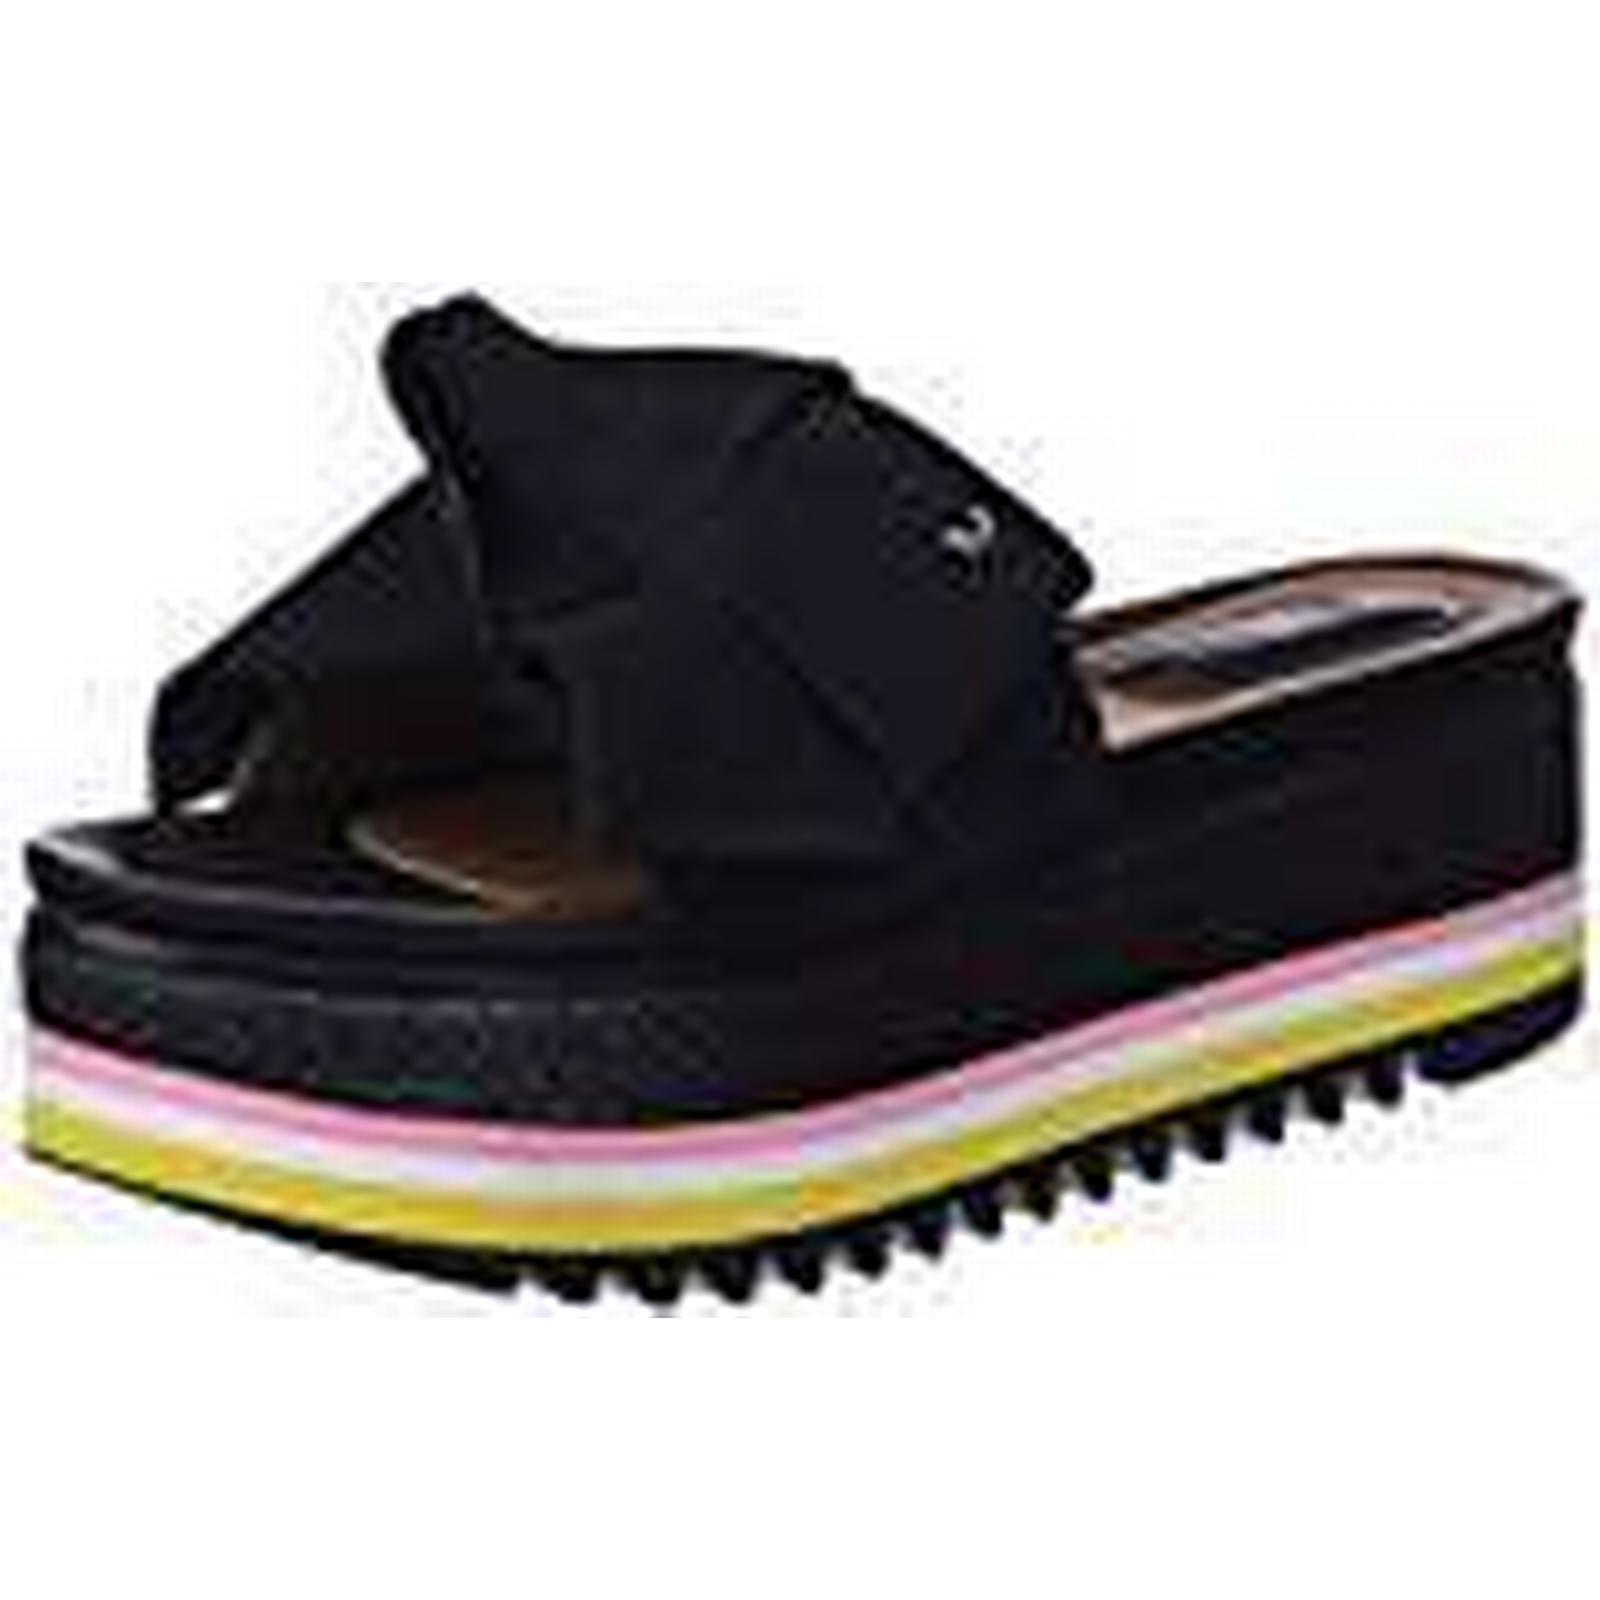 Gioseppo Women's 44059 Platform Sandals, UK Black, 5 UK Sandals, 2304e0